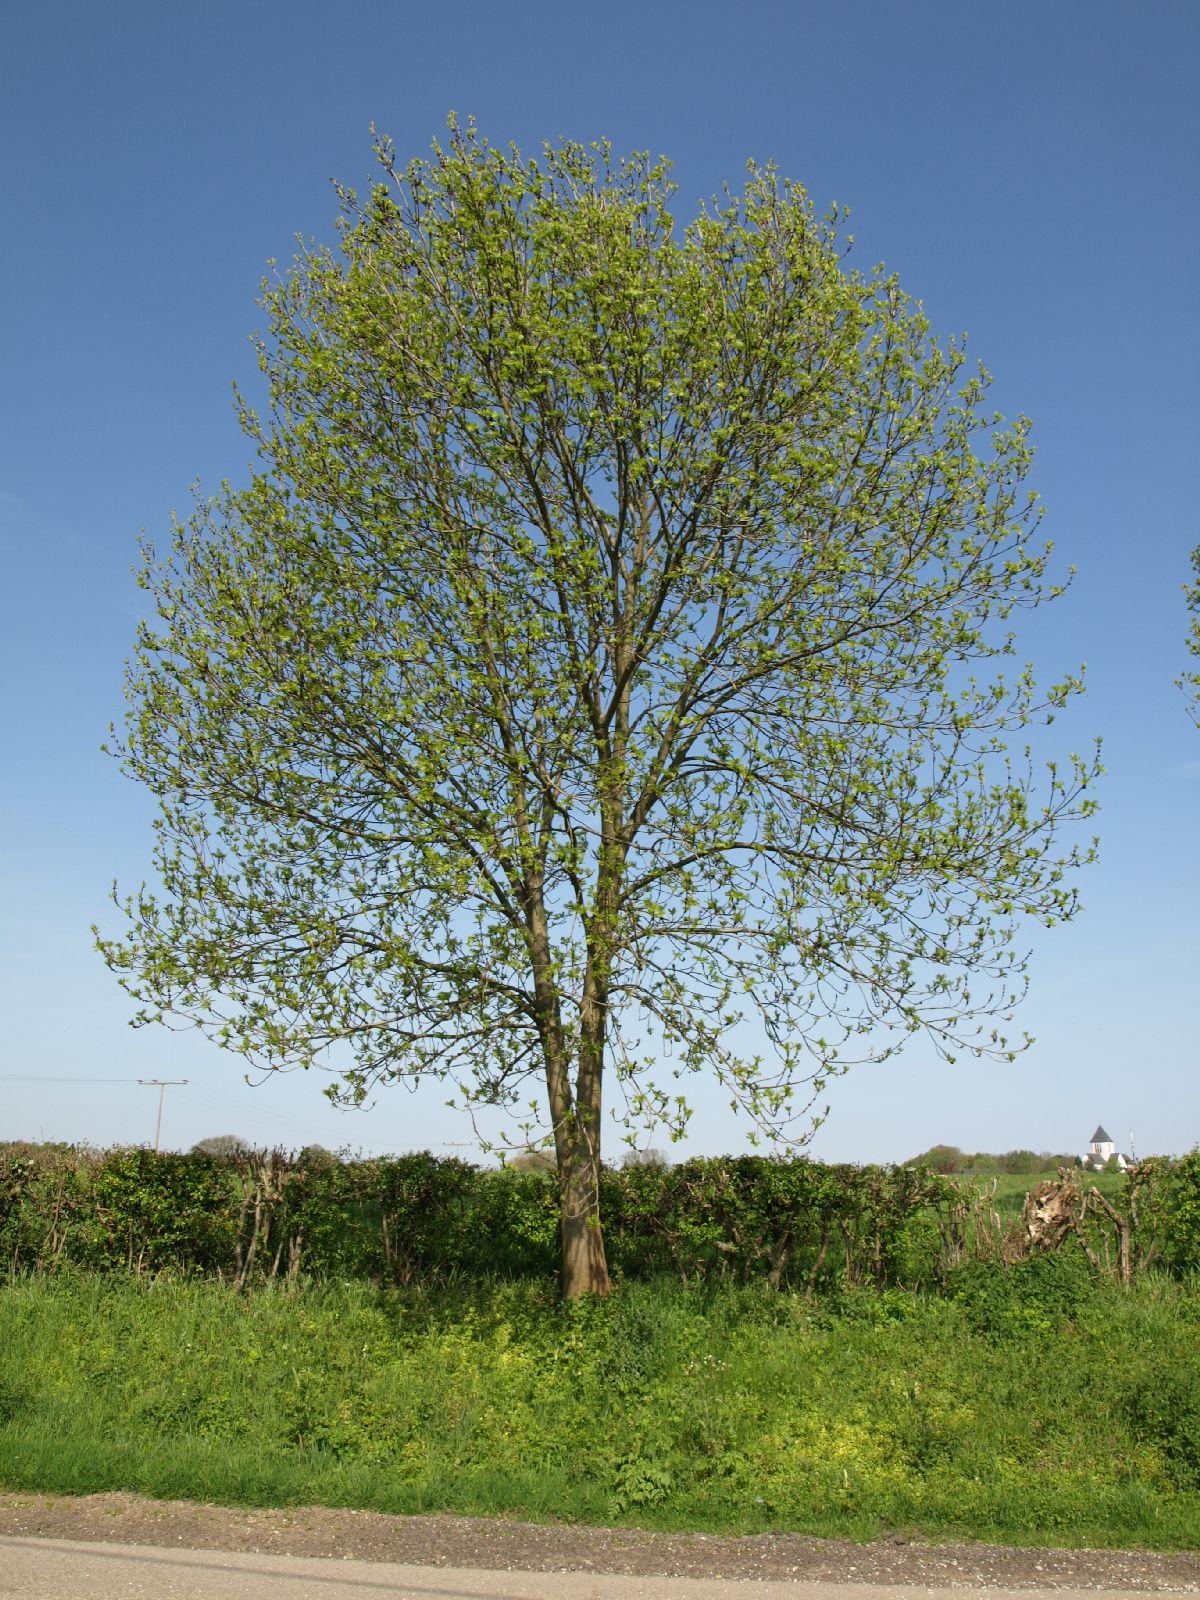 Pflanzen-Baum-Foto_Textur_B_P5042409